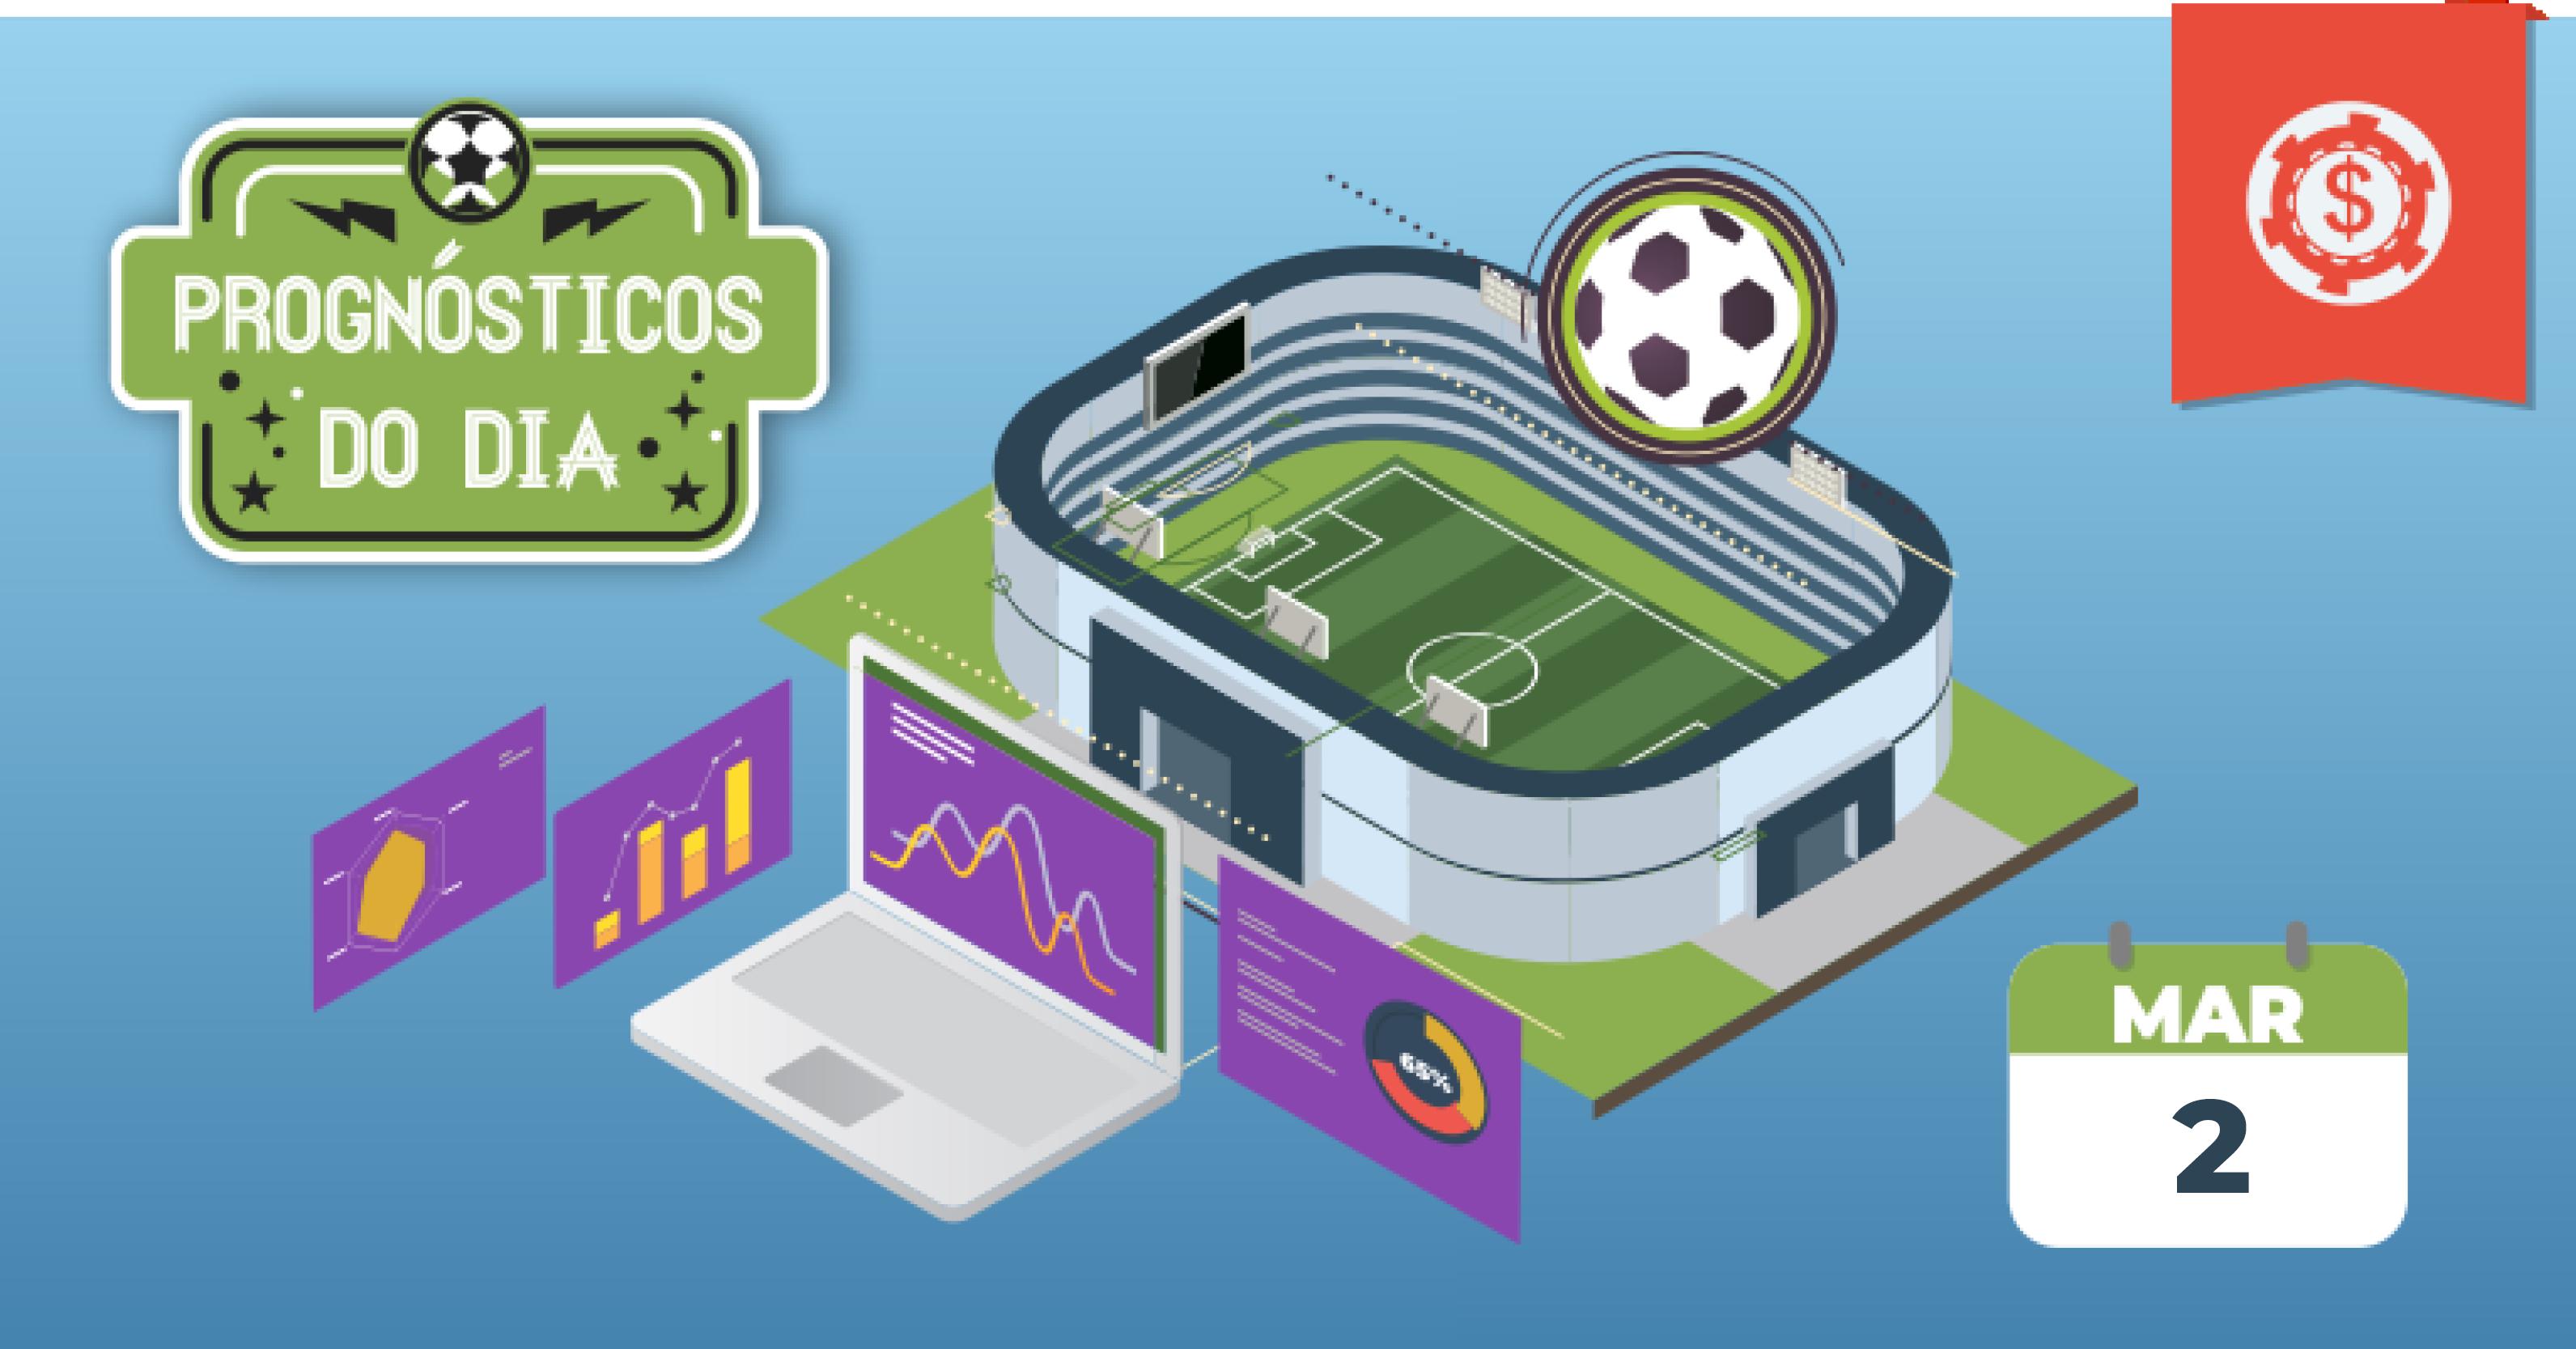 palpites-futebol-hoje-prognosticos-2-marco-2020